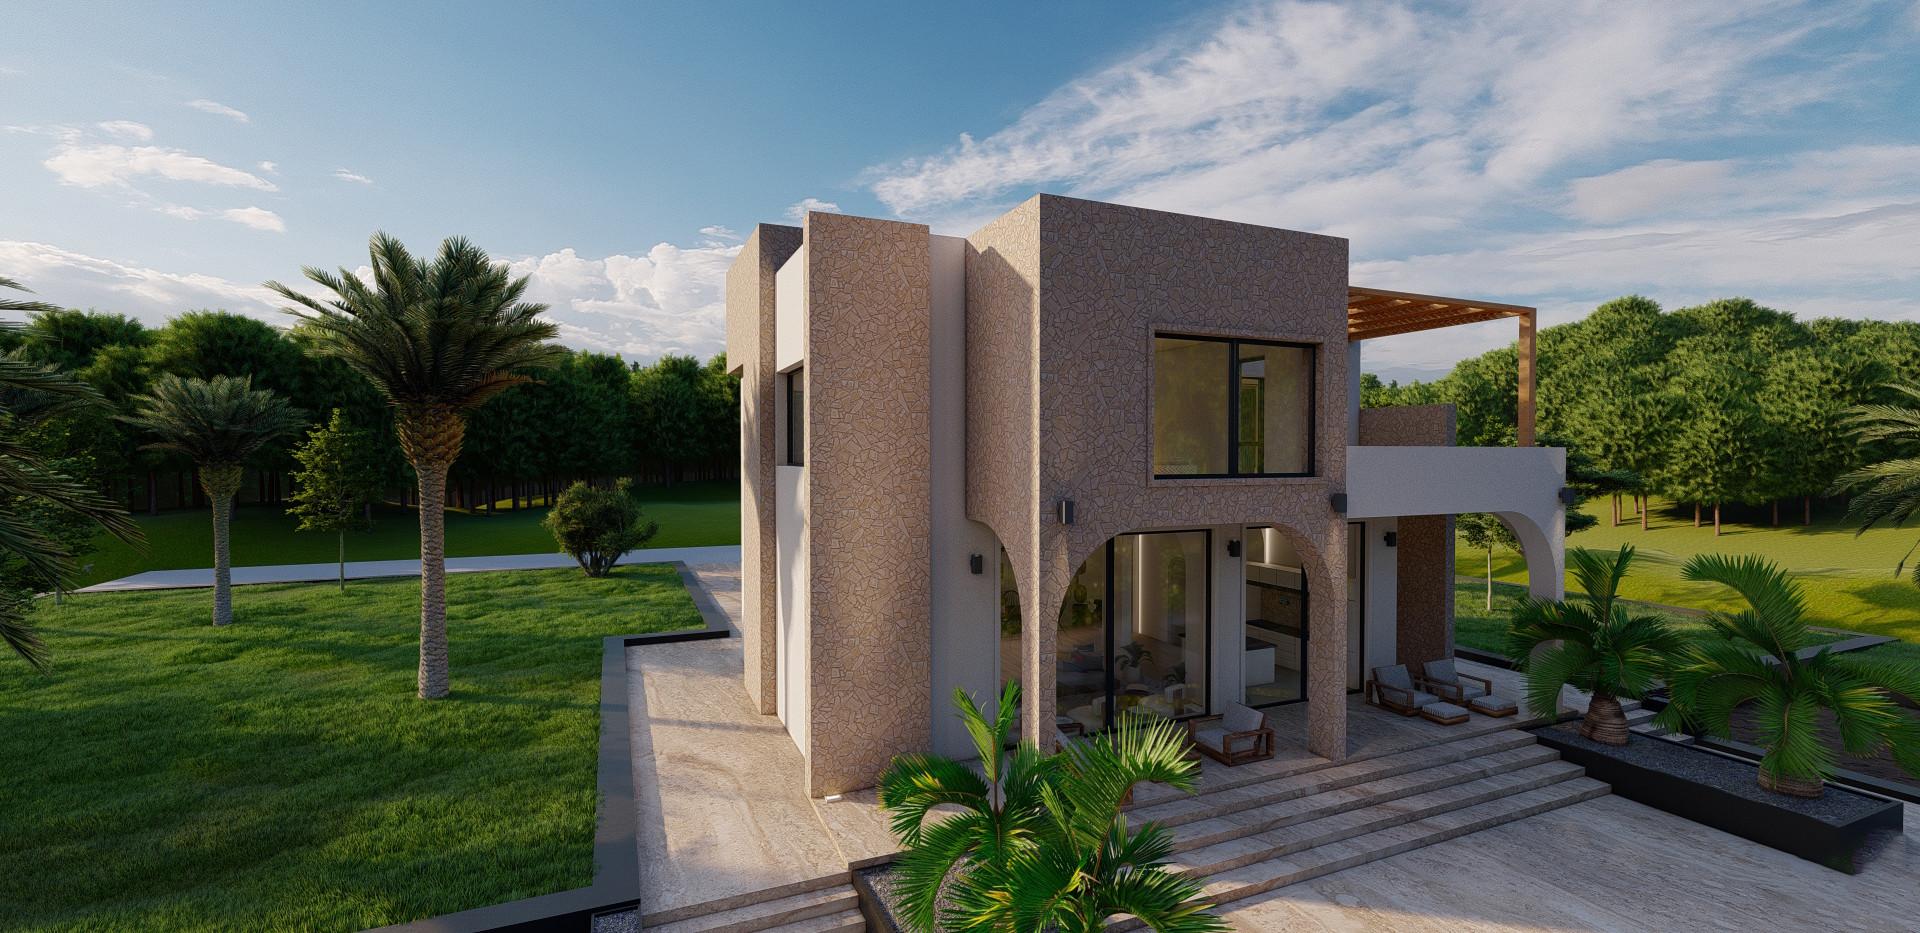 Daytime Villa Exterior - Ibiza, Spain